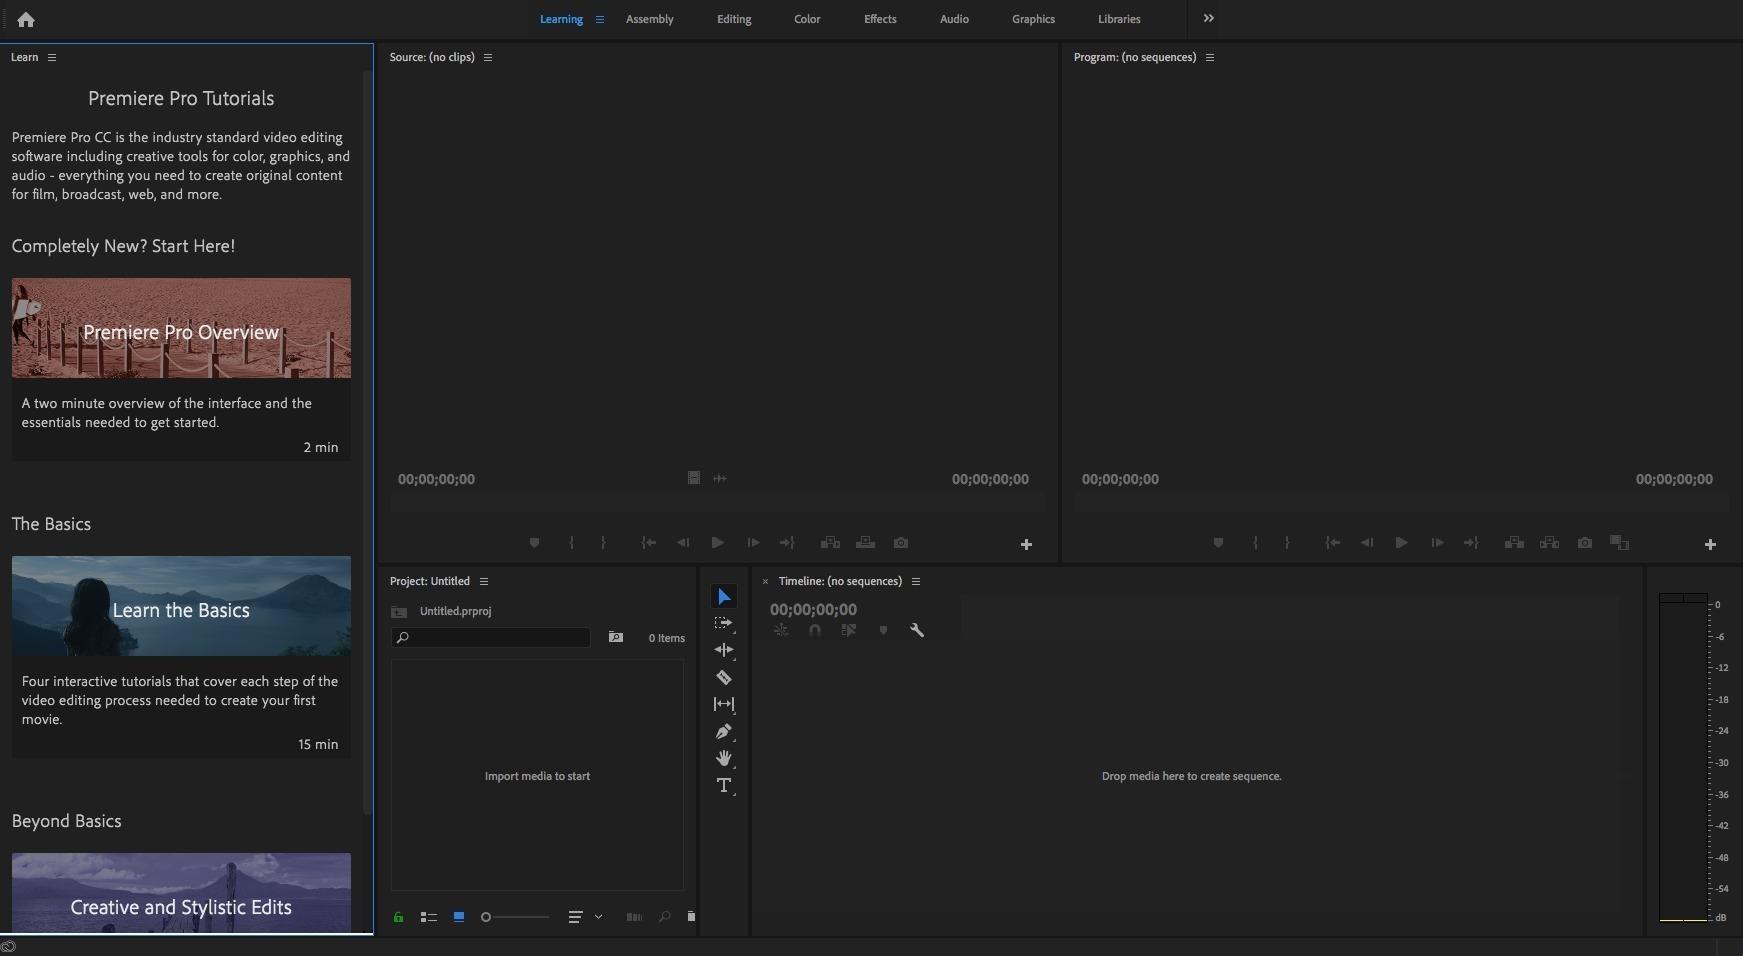 Adobe Premiere Pro CC 2019 13 1 3 | download |AppKed